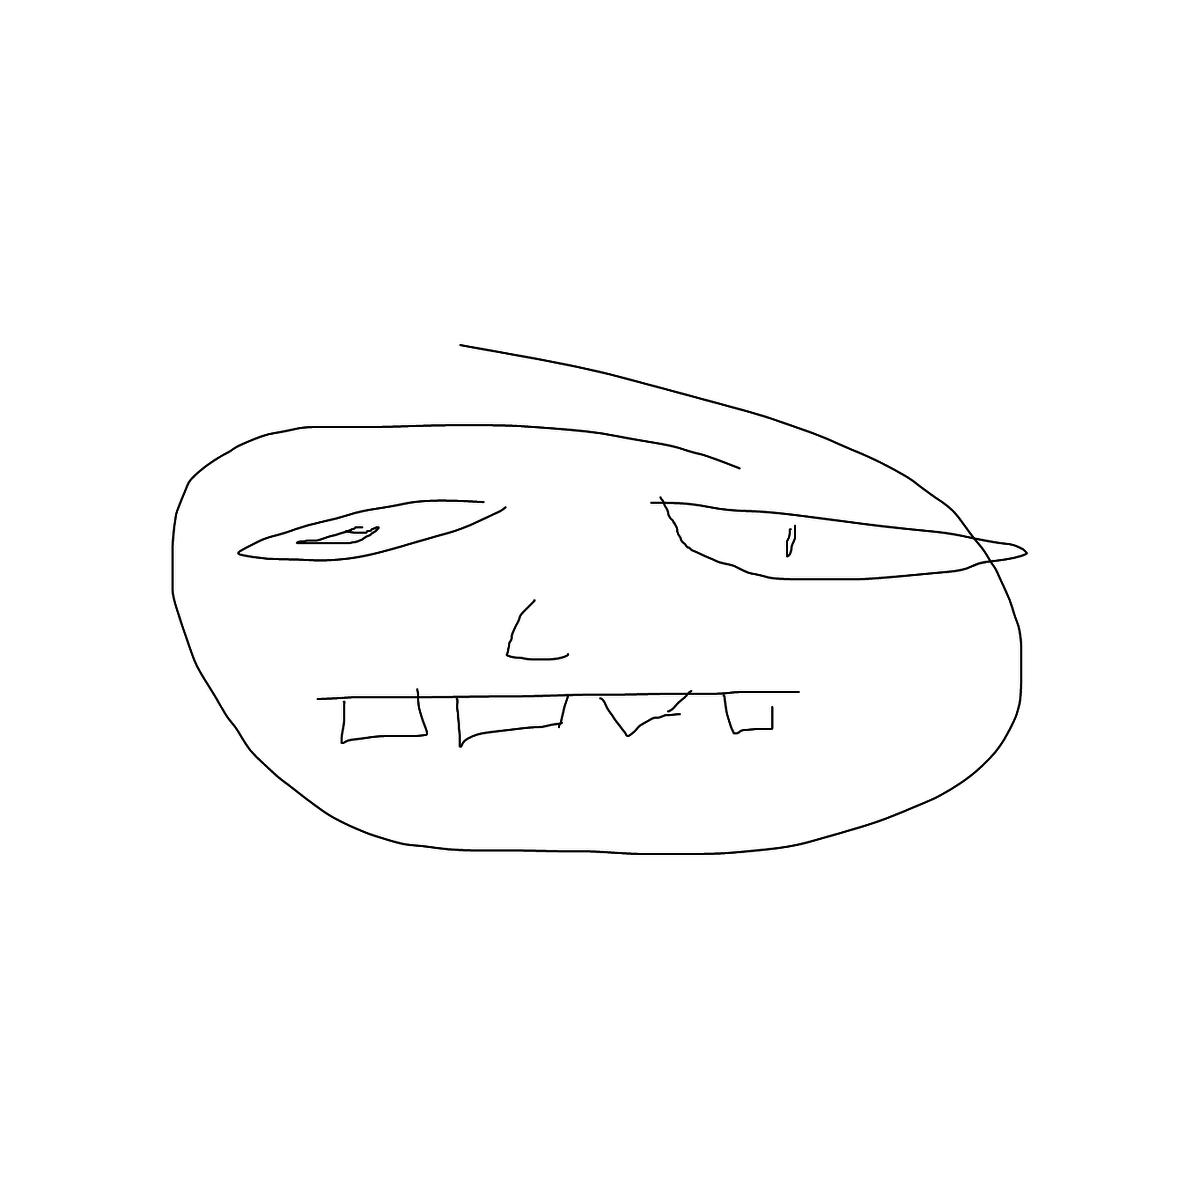 BAAAM drawing#23616 lat:45.8117408752441400lng: 15.9730644226074220